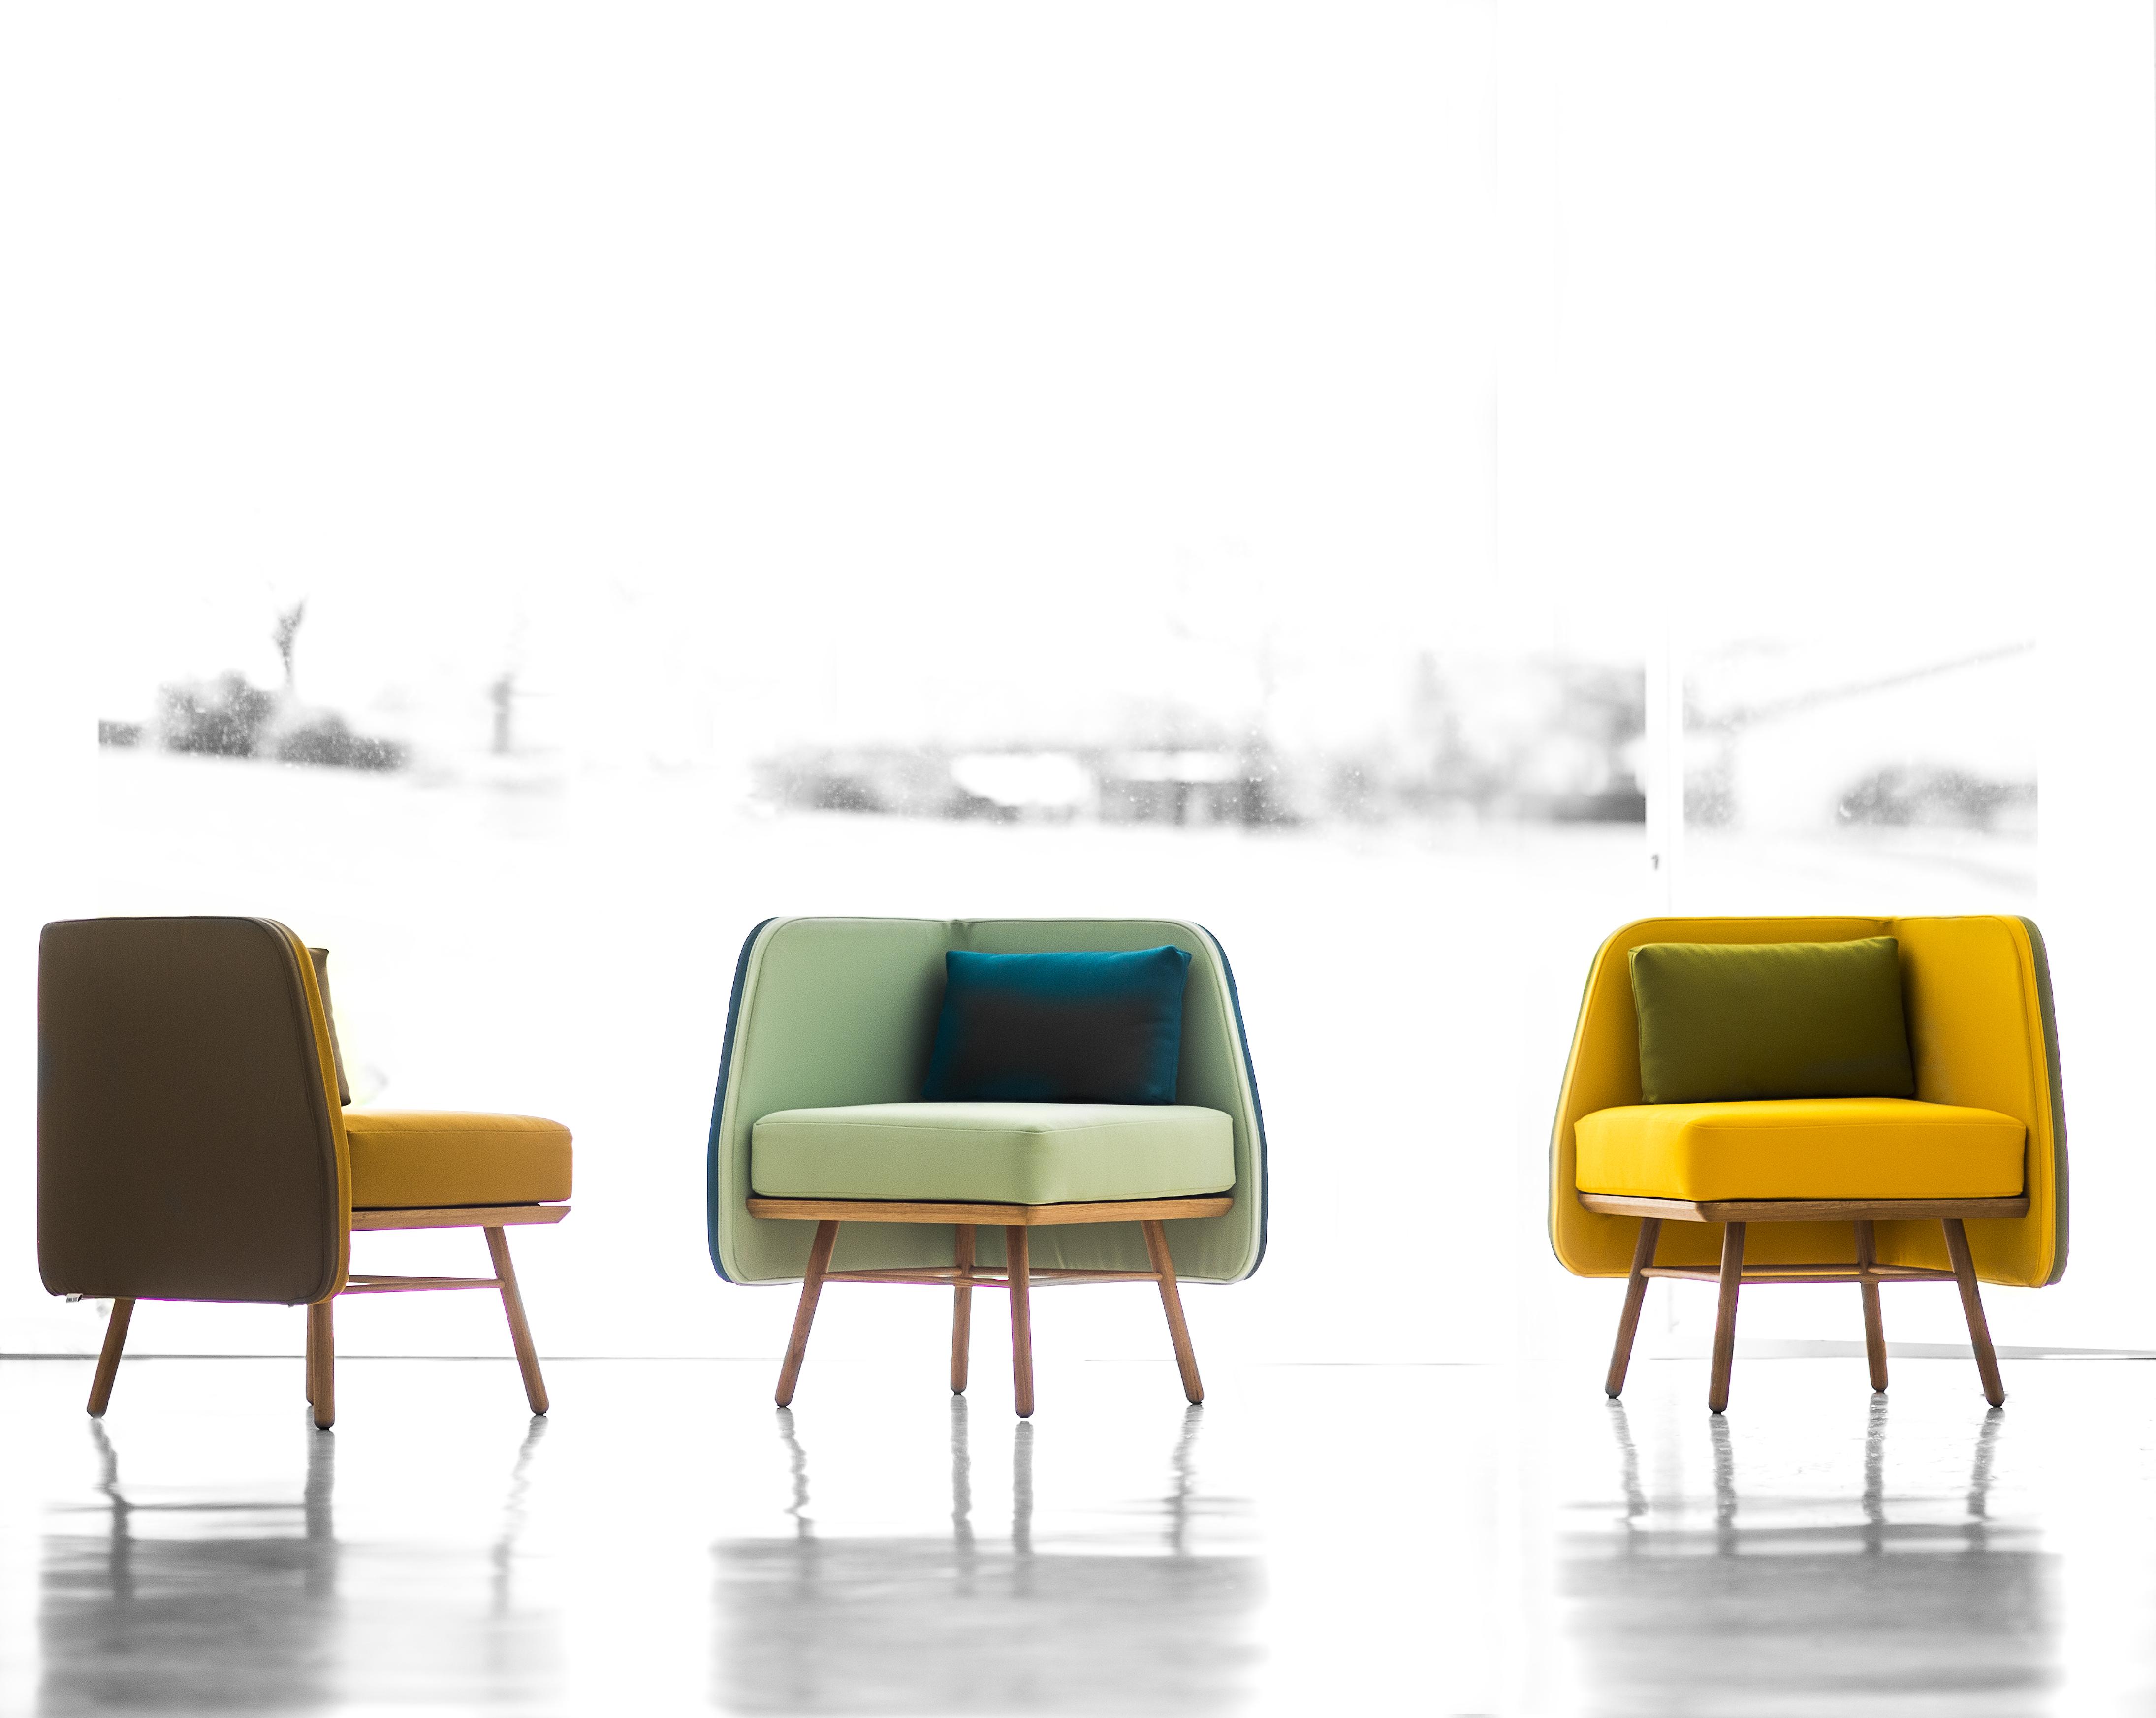 Bi Silla| 2014. Design Silvia Ceñal